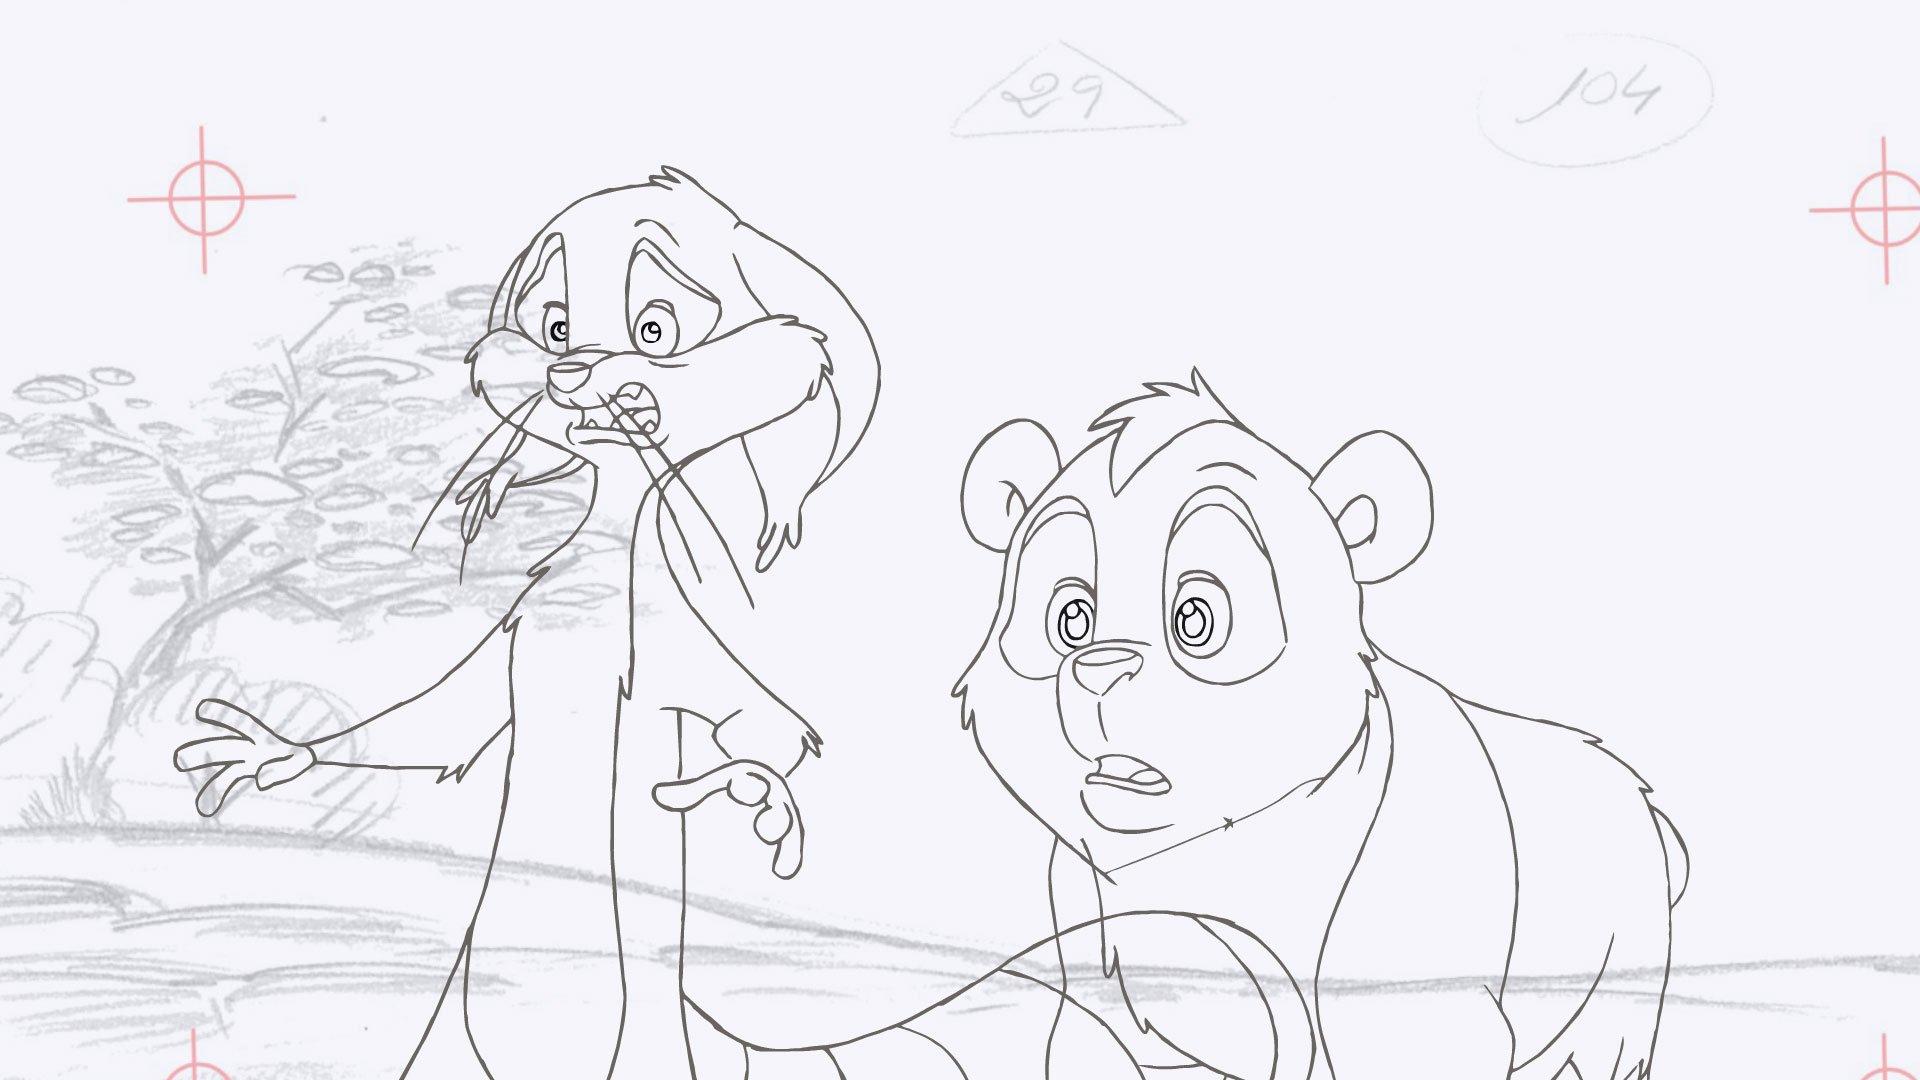 Manchu (The Little Big Panda)